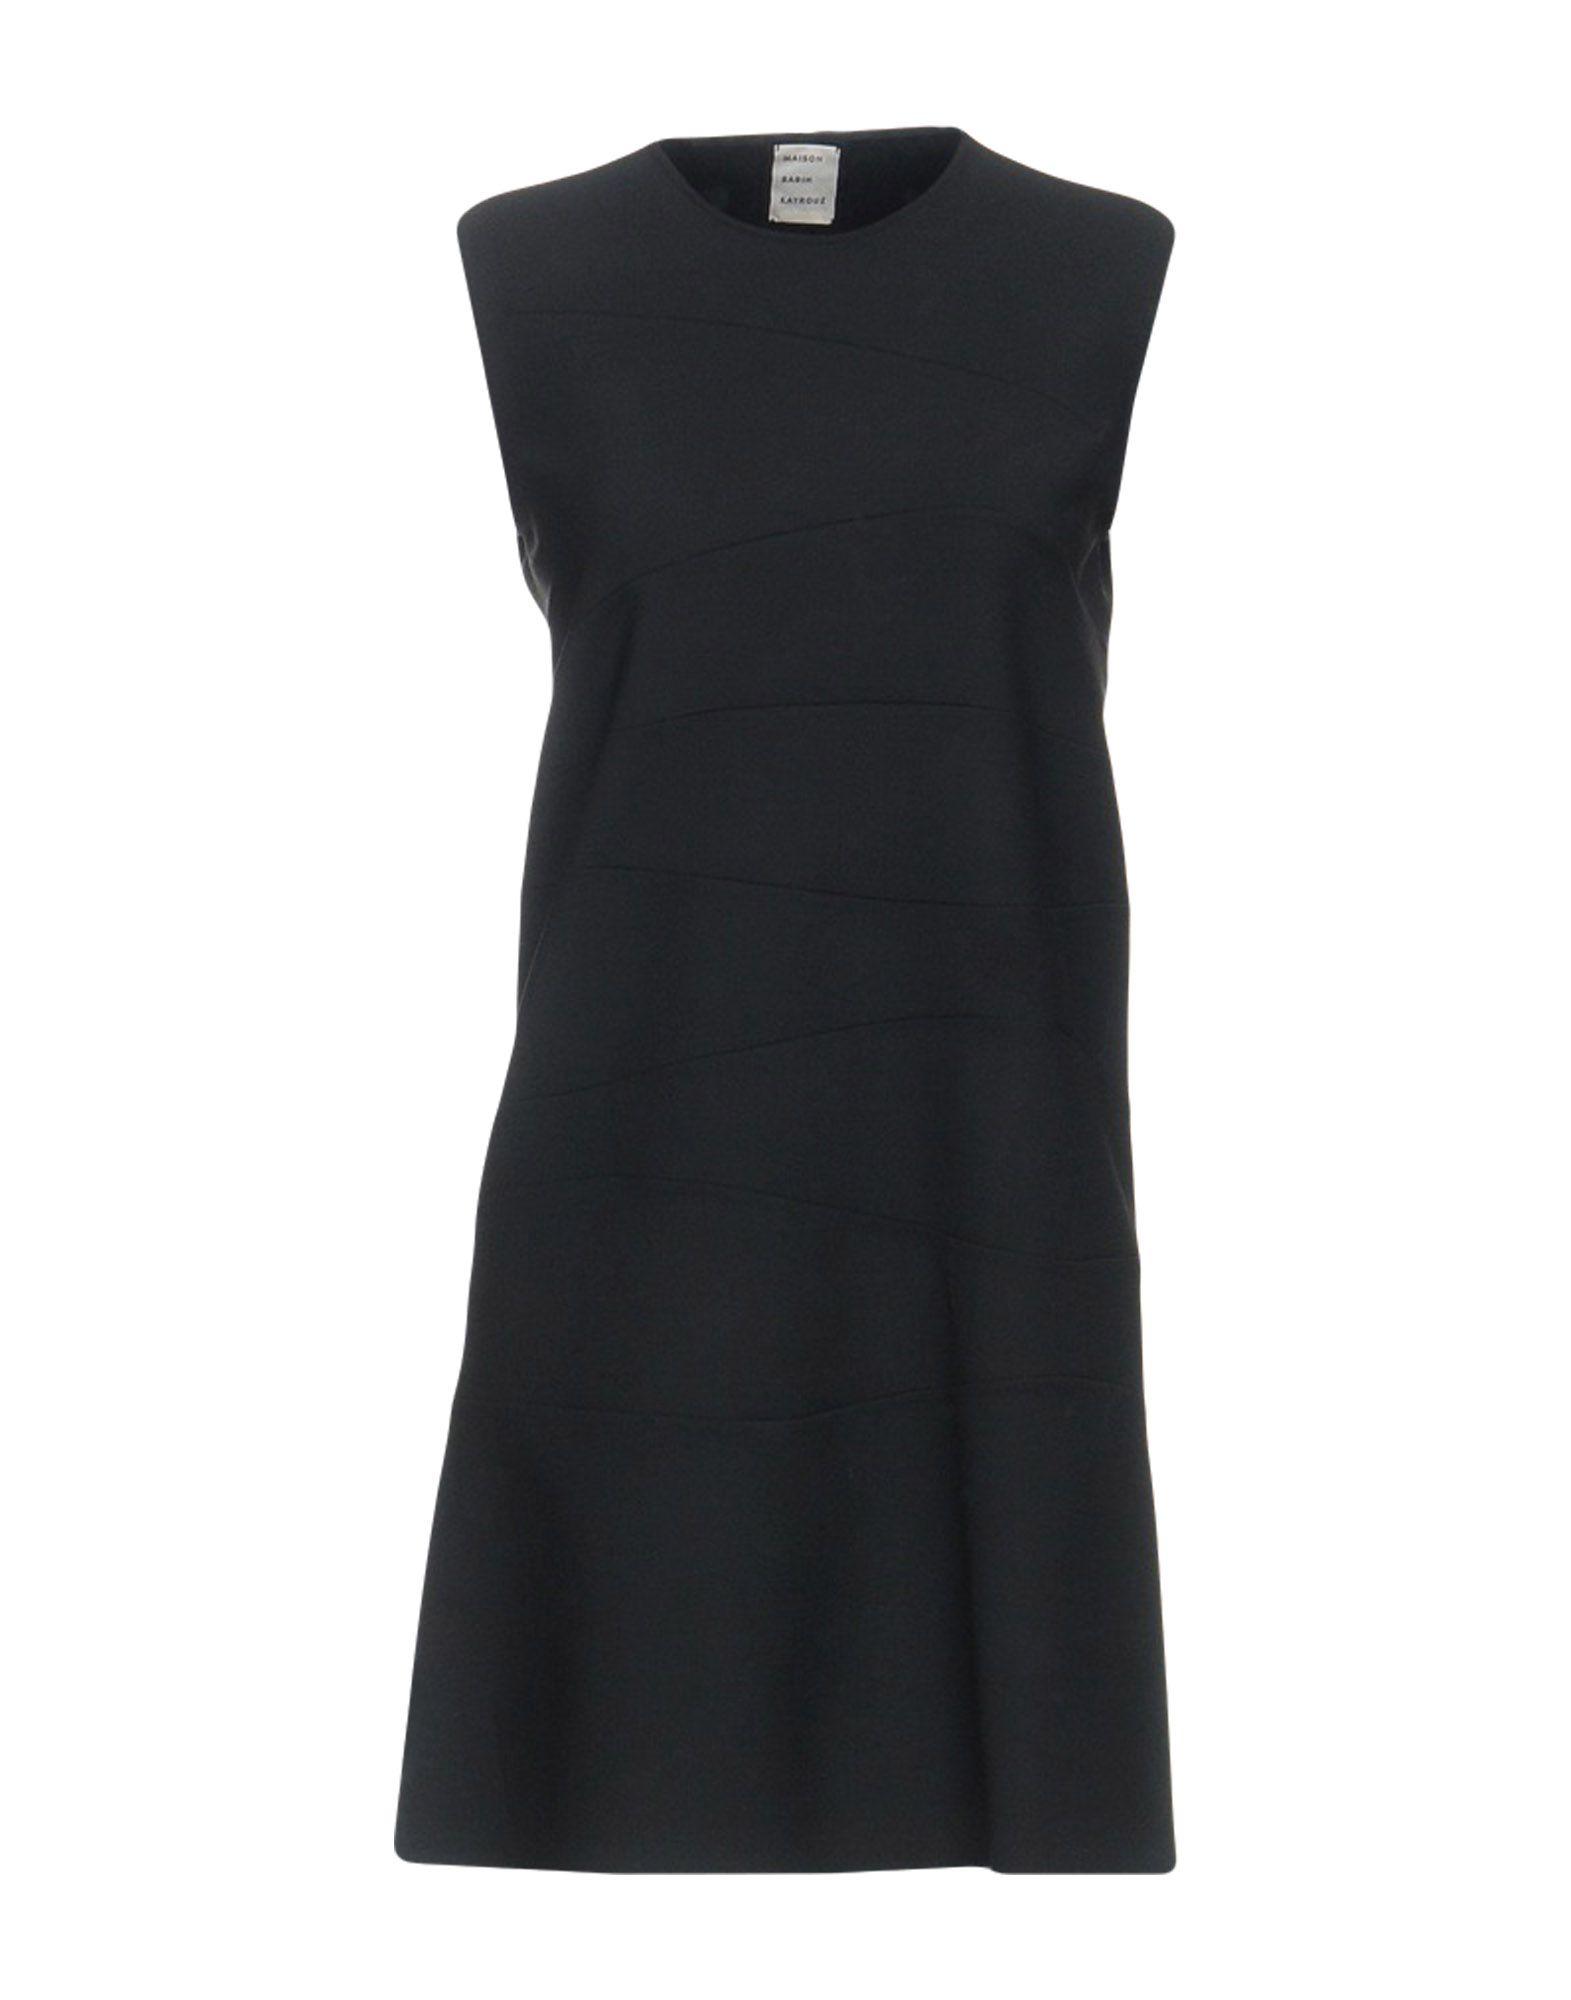 MAISON RABIH KAYROUZ Короткое платье maison rabih kayrouz блузка